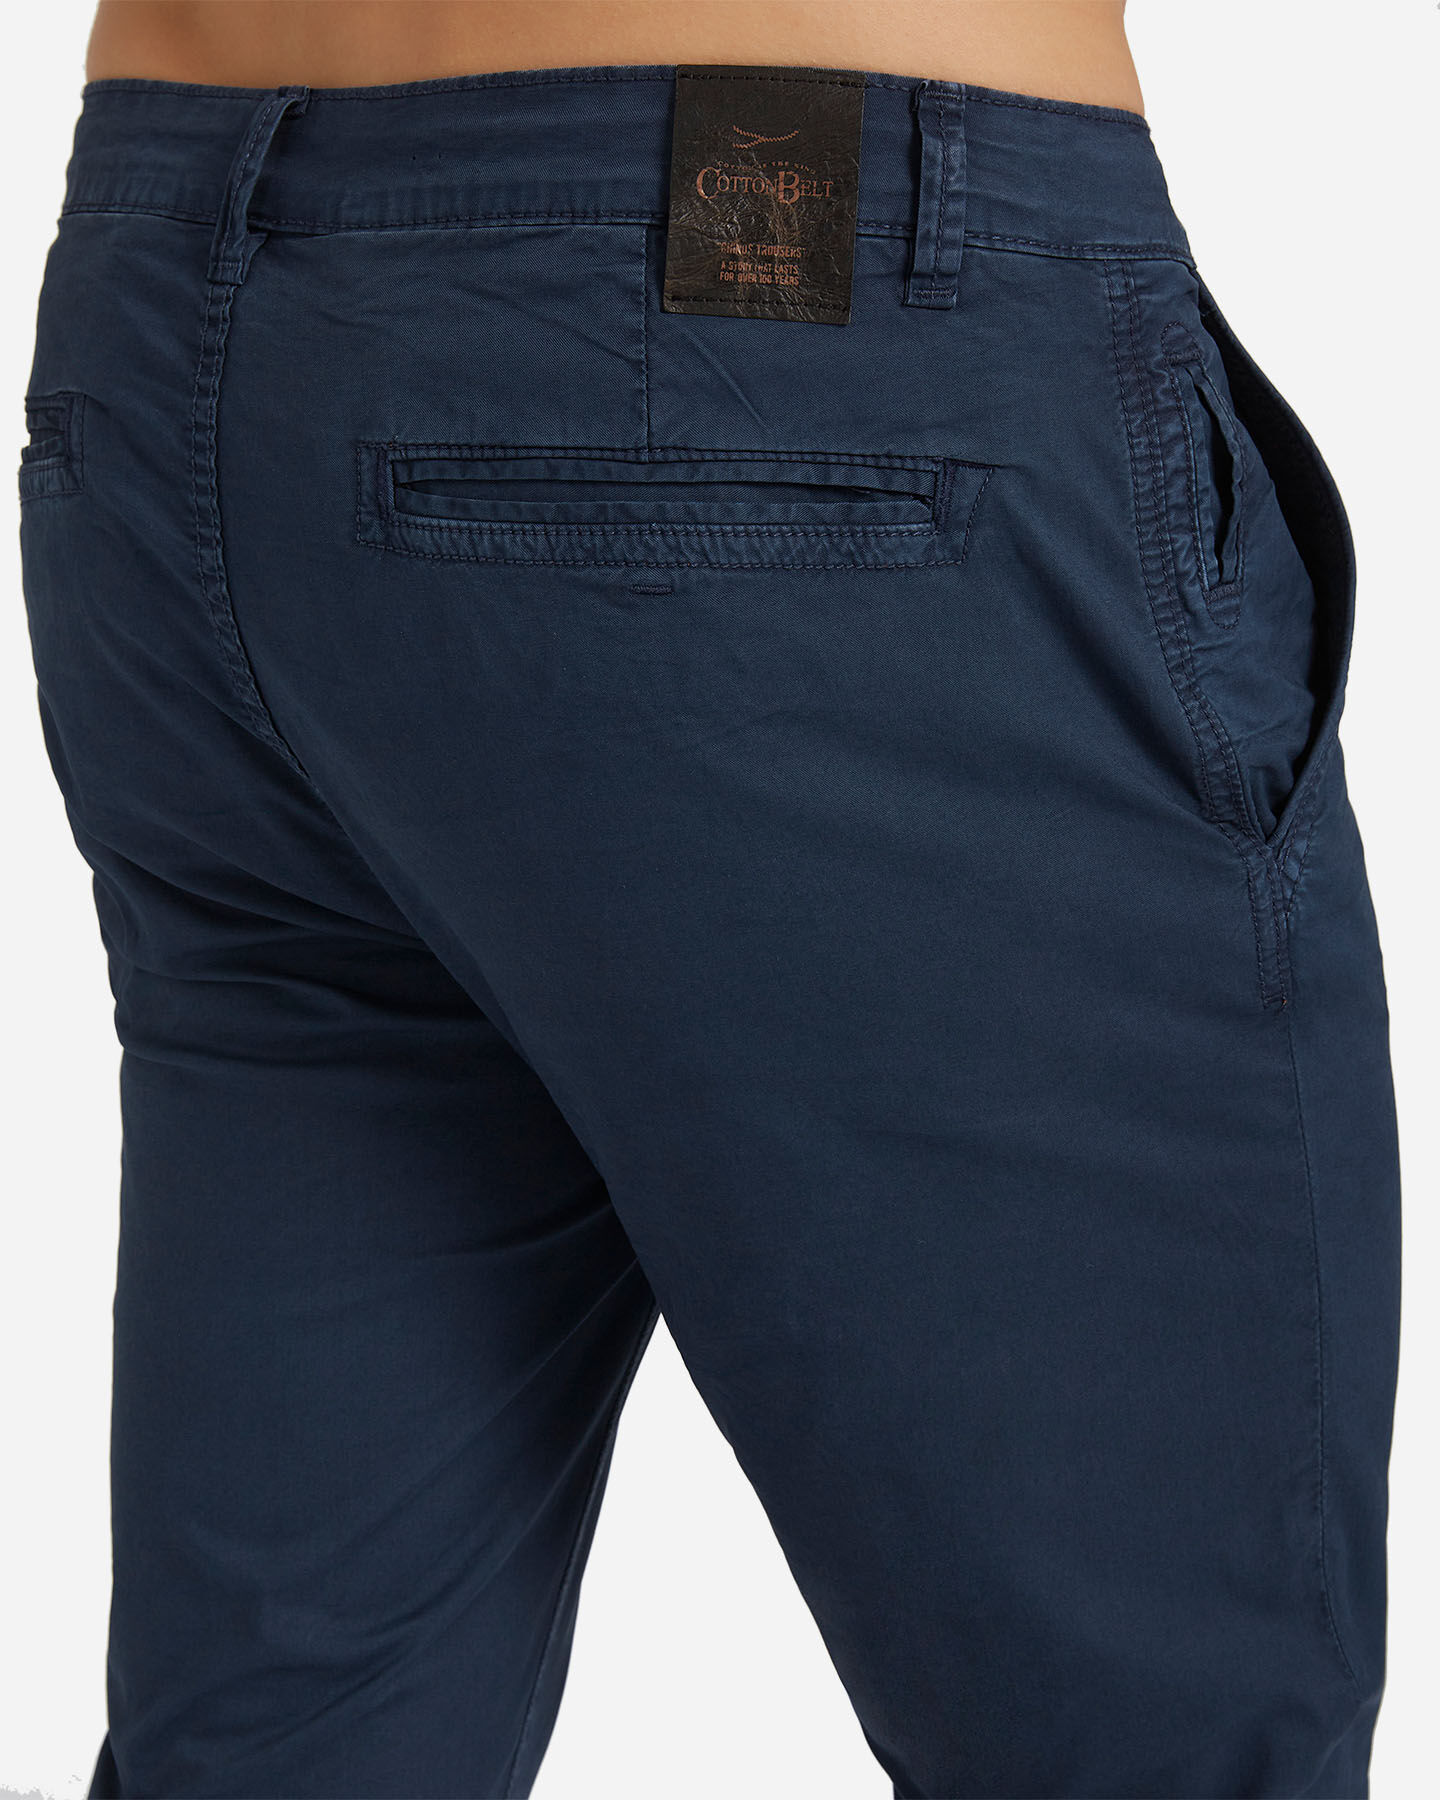 Pantalone COTTON BELT CHINO SLIM M S5182785 scatto 3